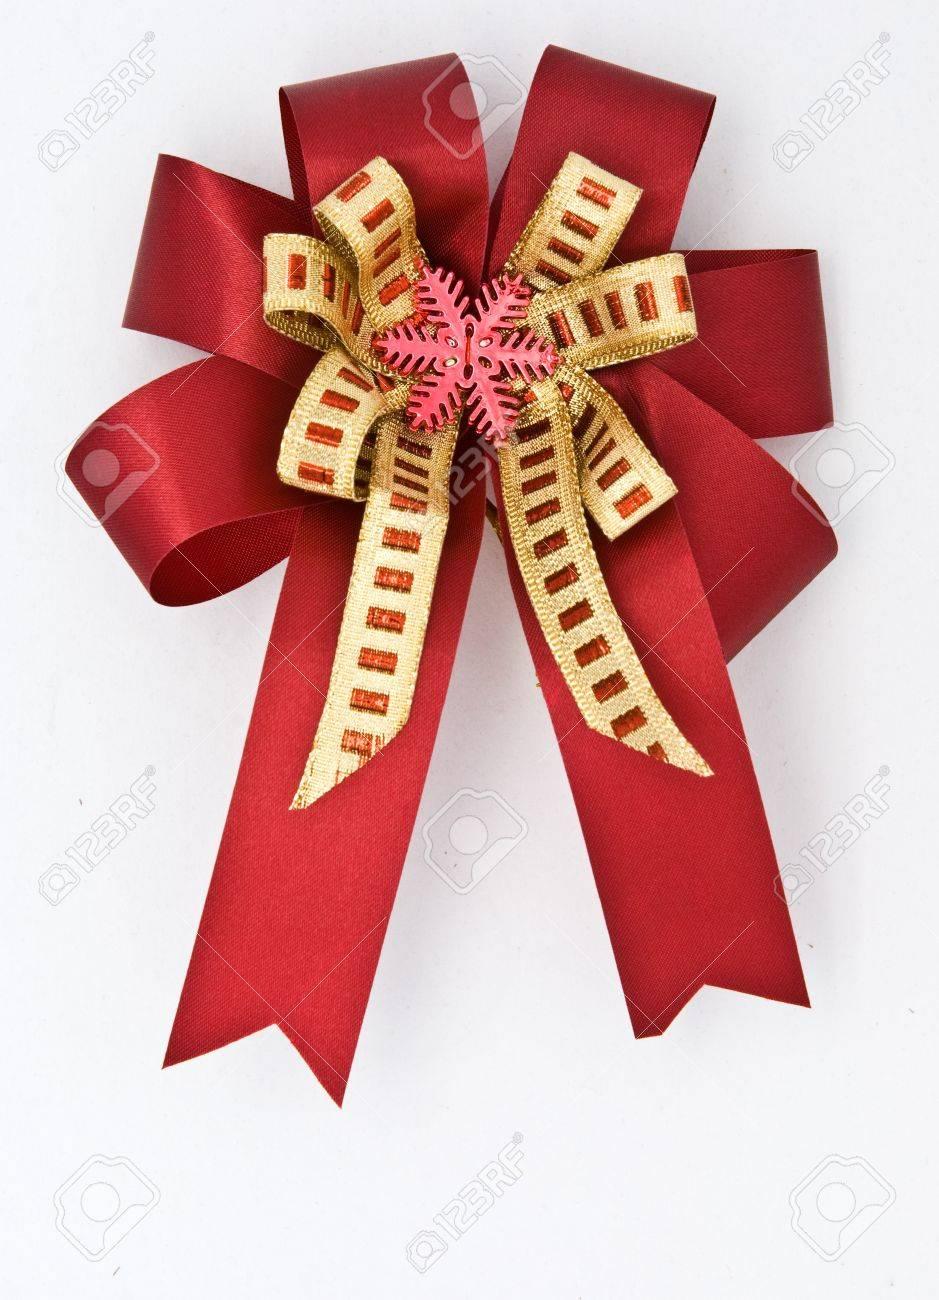 ribbon bow for gift box Stock Photo - 8521628